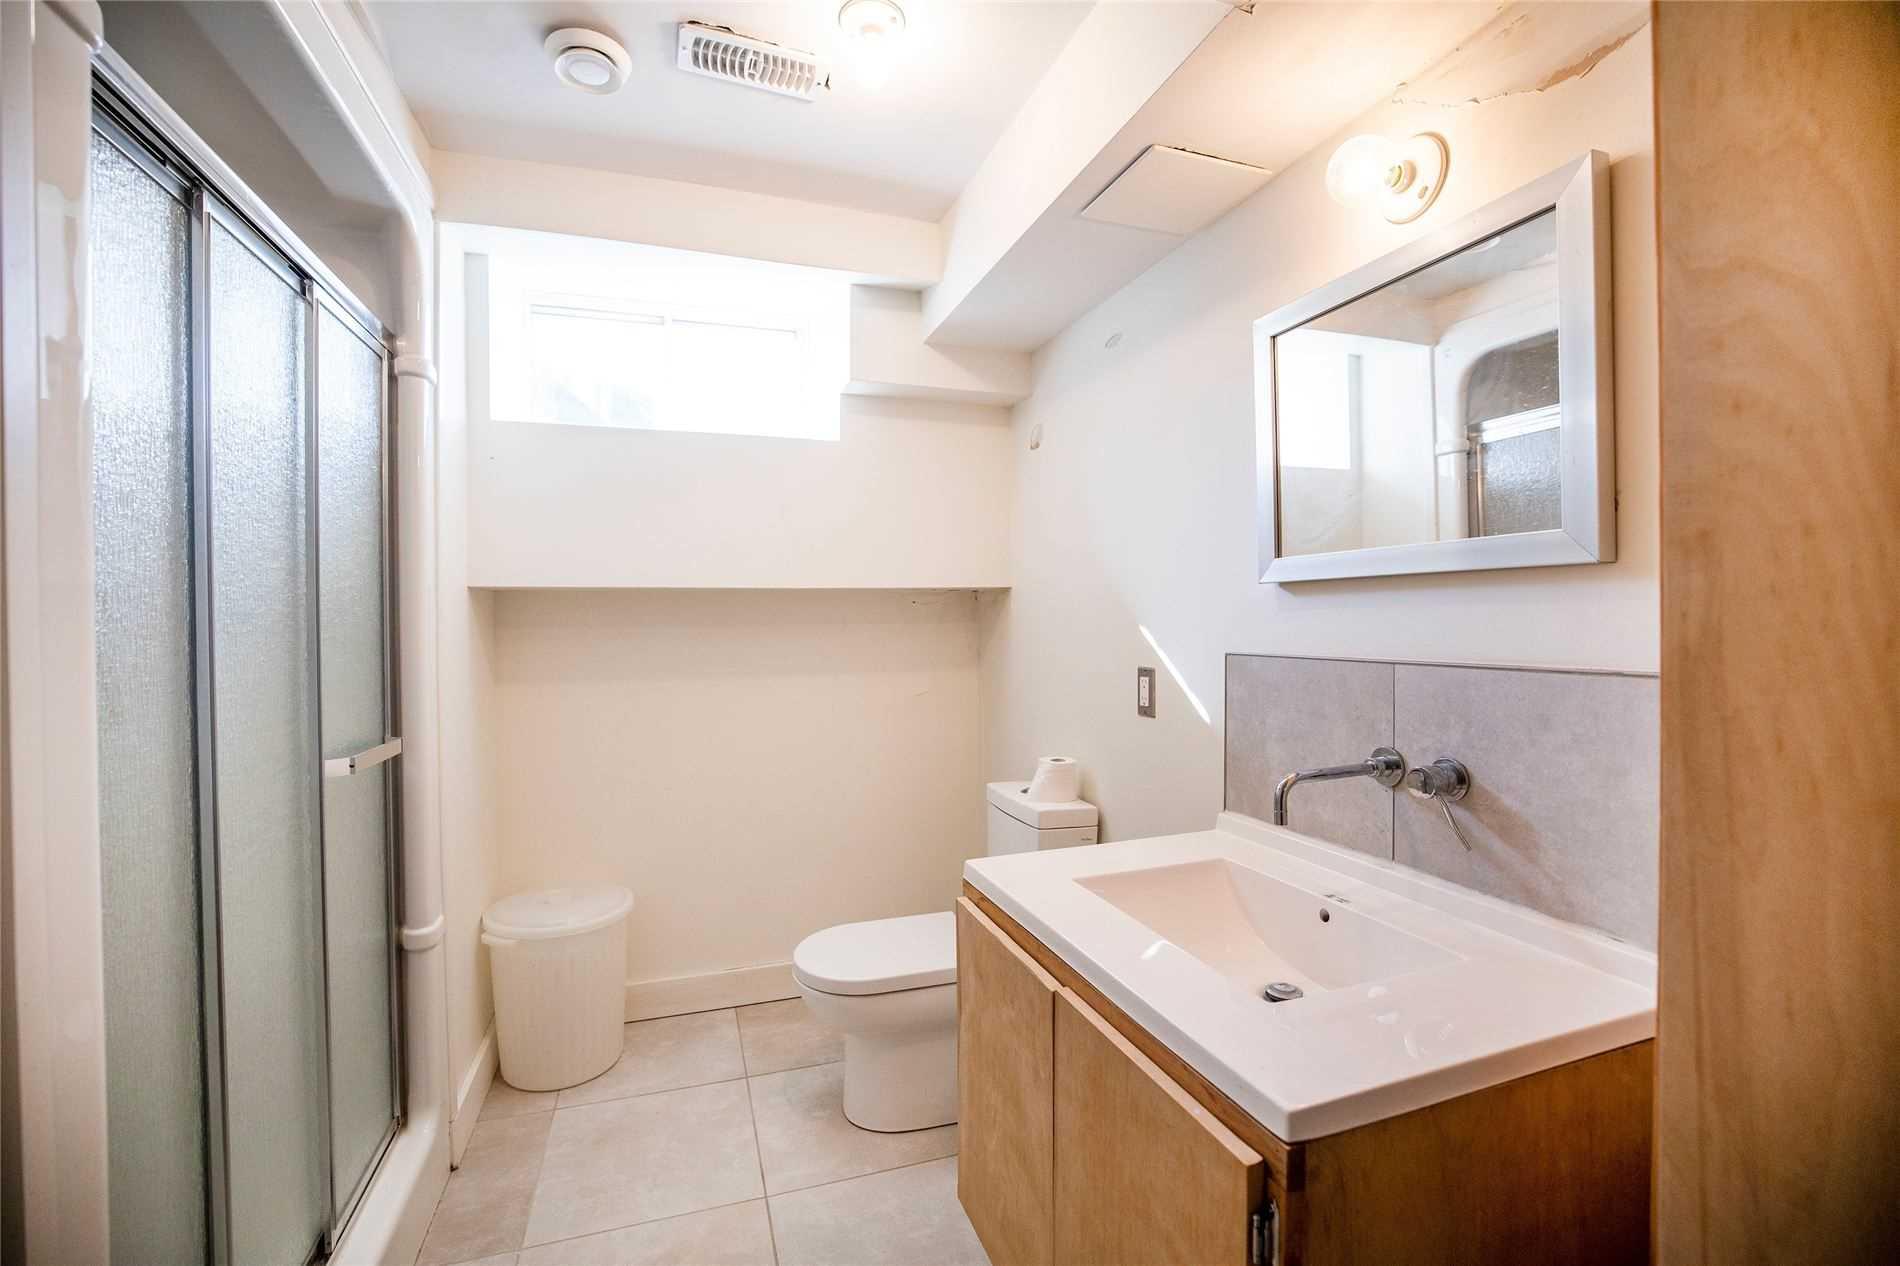 3021 Courtice Rd, Clarington, Ontario L1E2H8, 4 Bedrooms Bedrooms, 7 Rooms Rooms,4 BathroomsBathrooms,Detached,For Sale,Courtice,E5168131